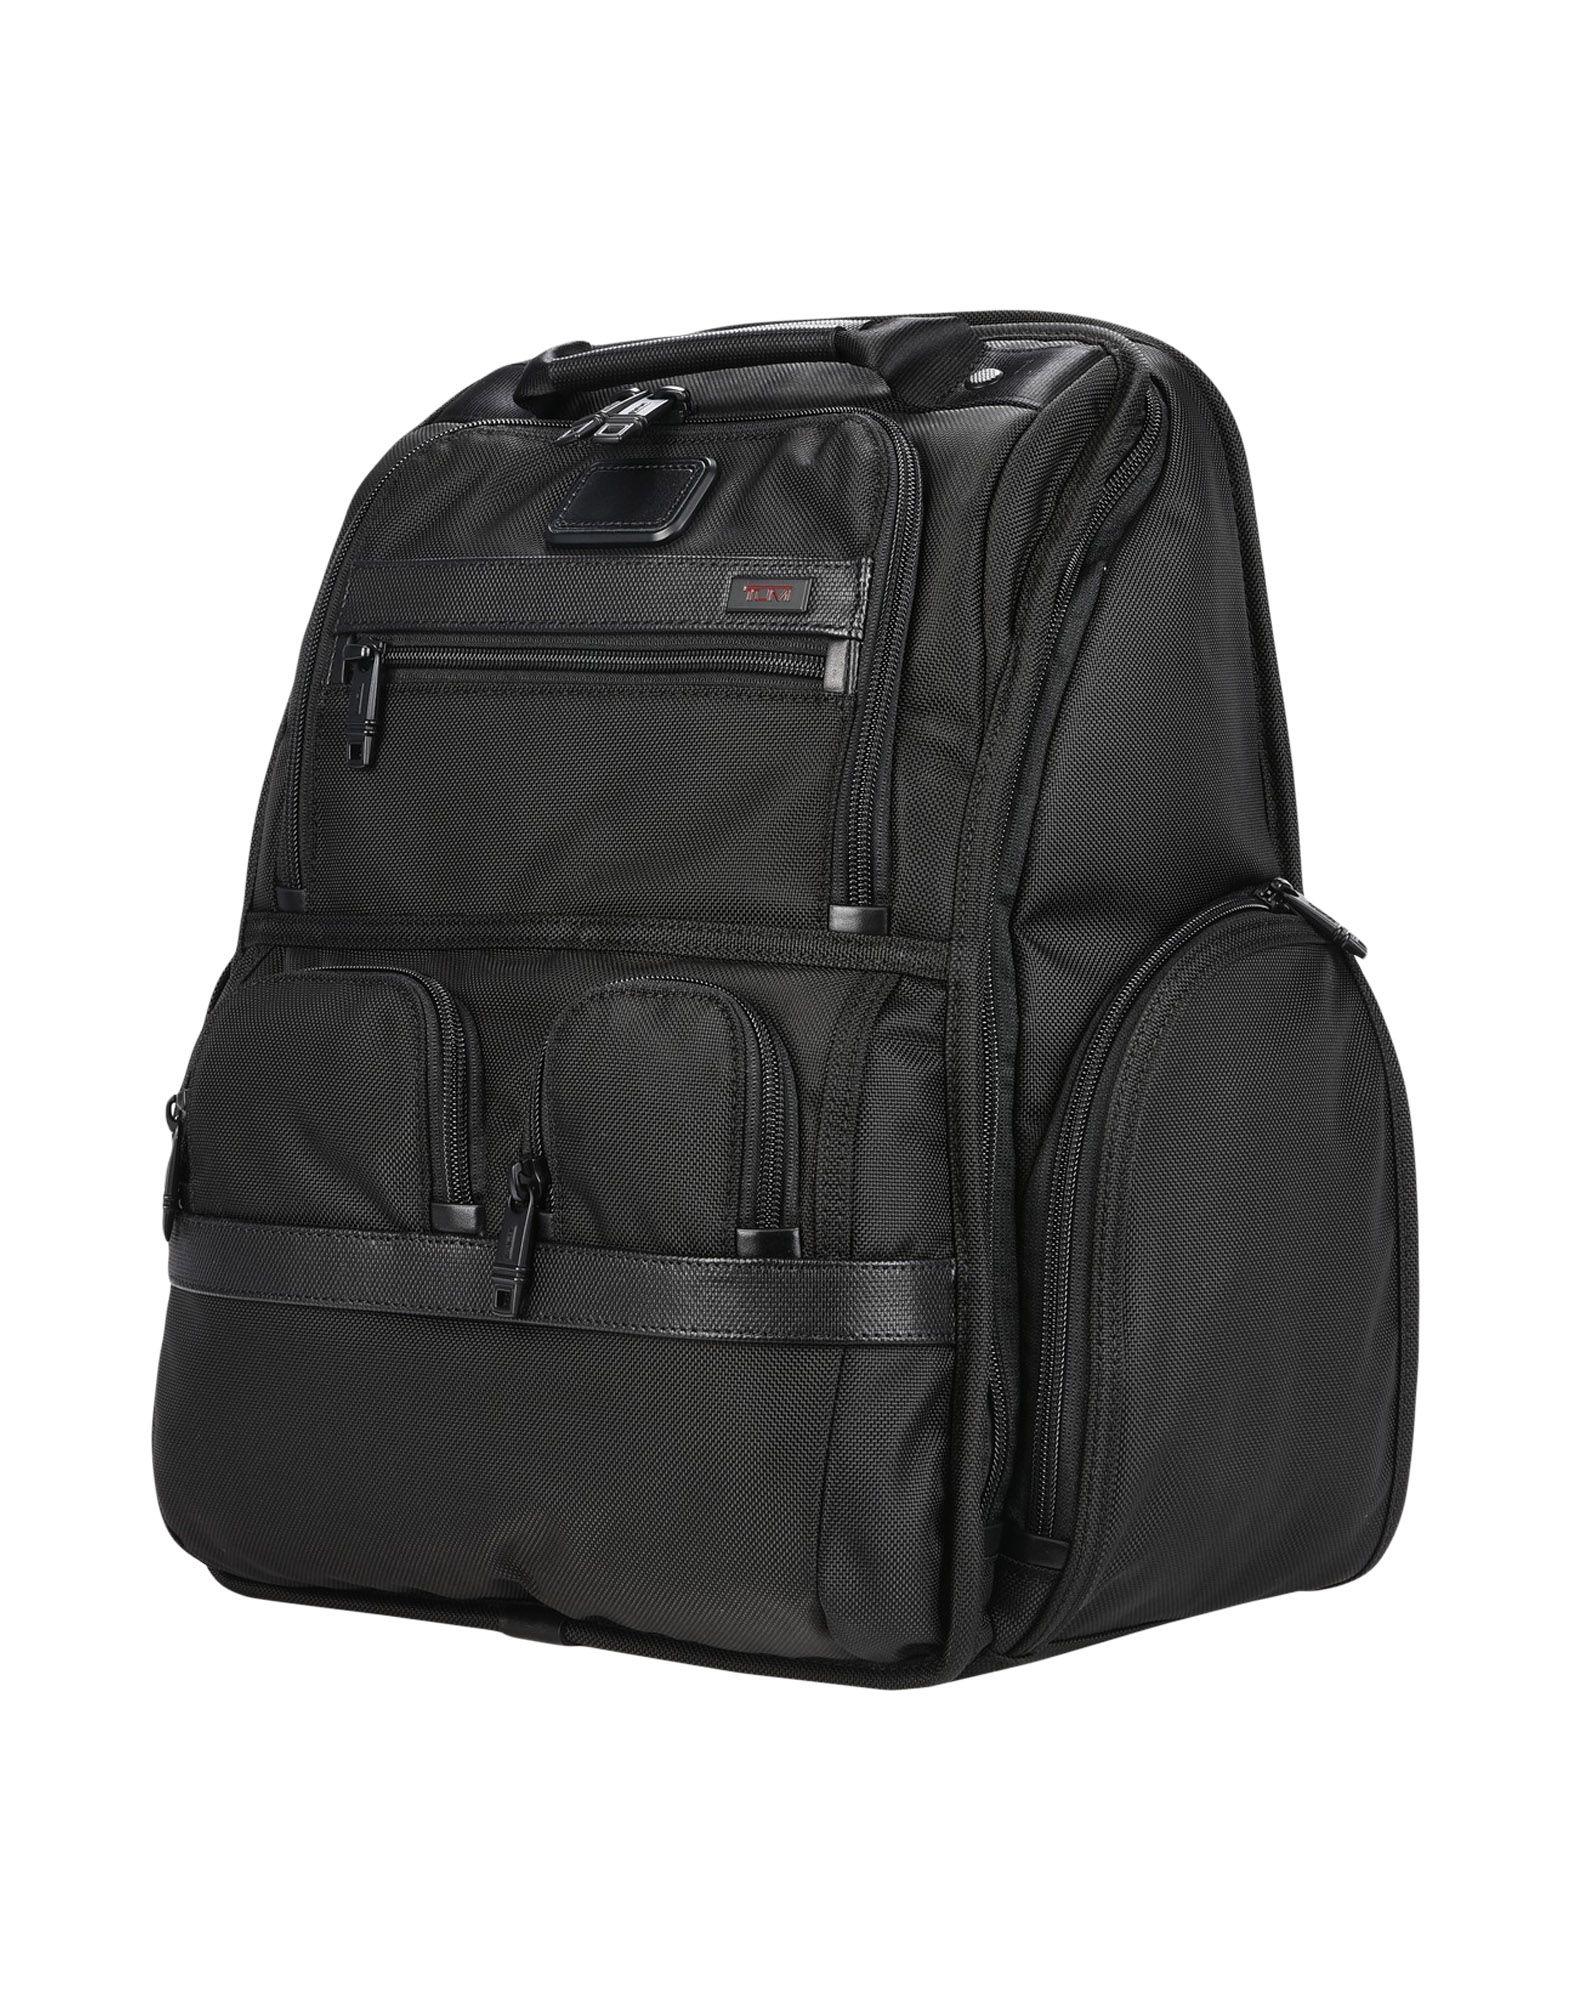 Zaini & Marsupi Tumi Compact Laptop Brief Pack - Uomo - Acquista online su